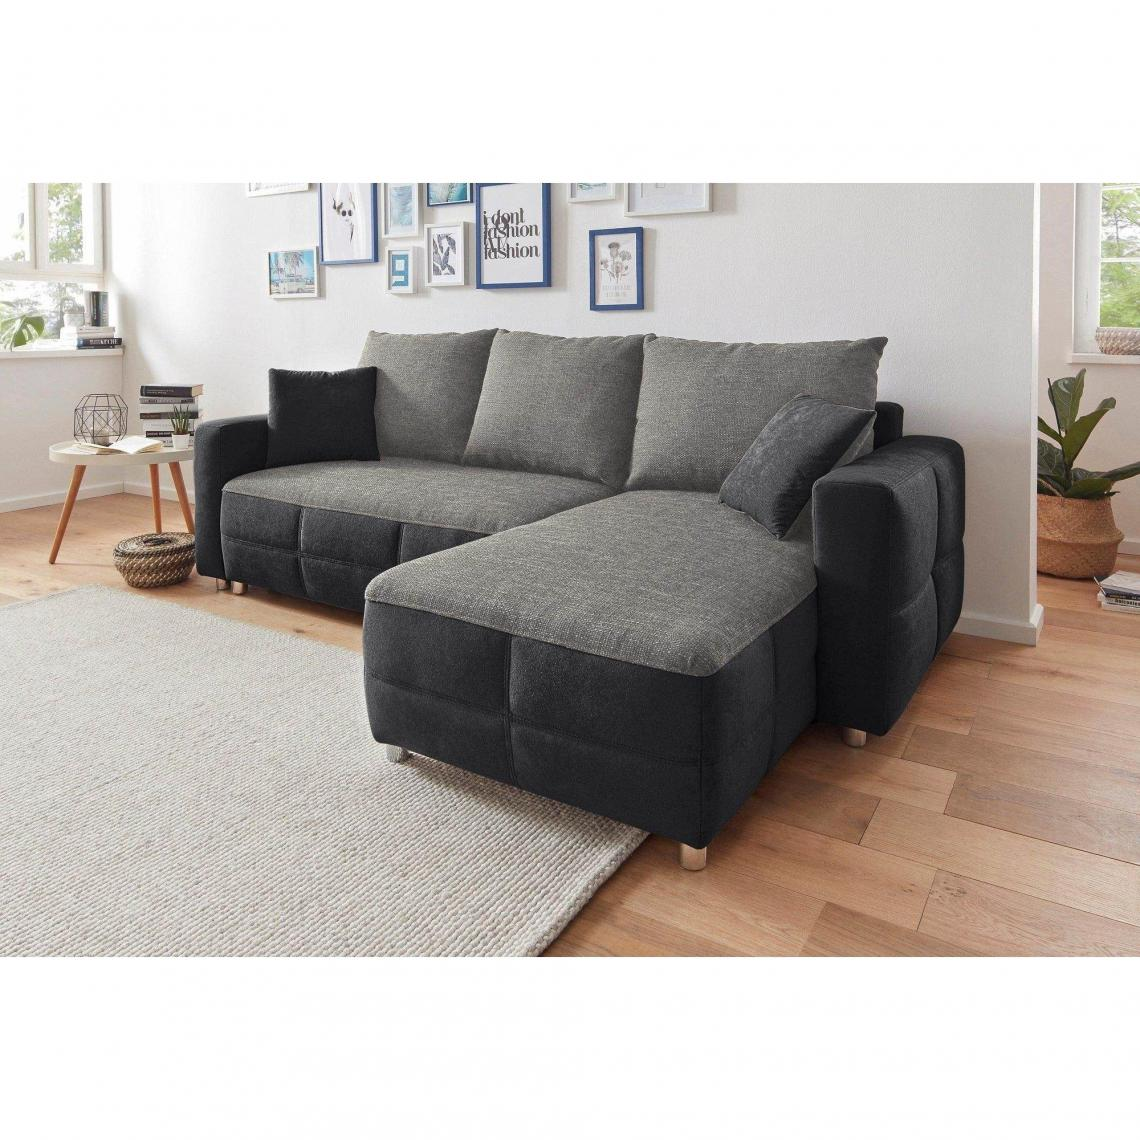 canap d angle m ridienne r versible conible avec coffre. Black Bedroom Furniture Sets. Home Design Ideas